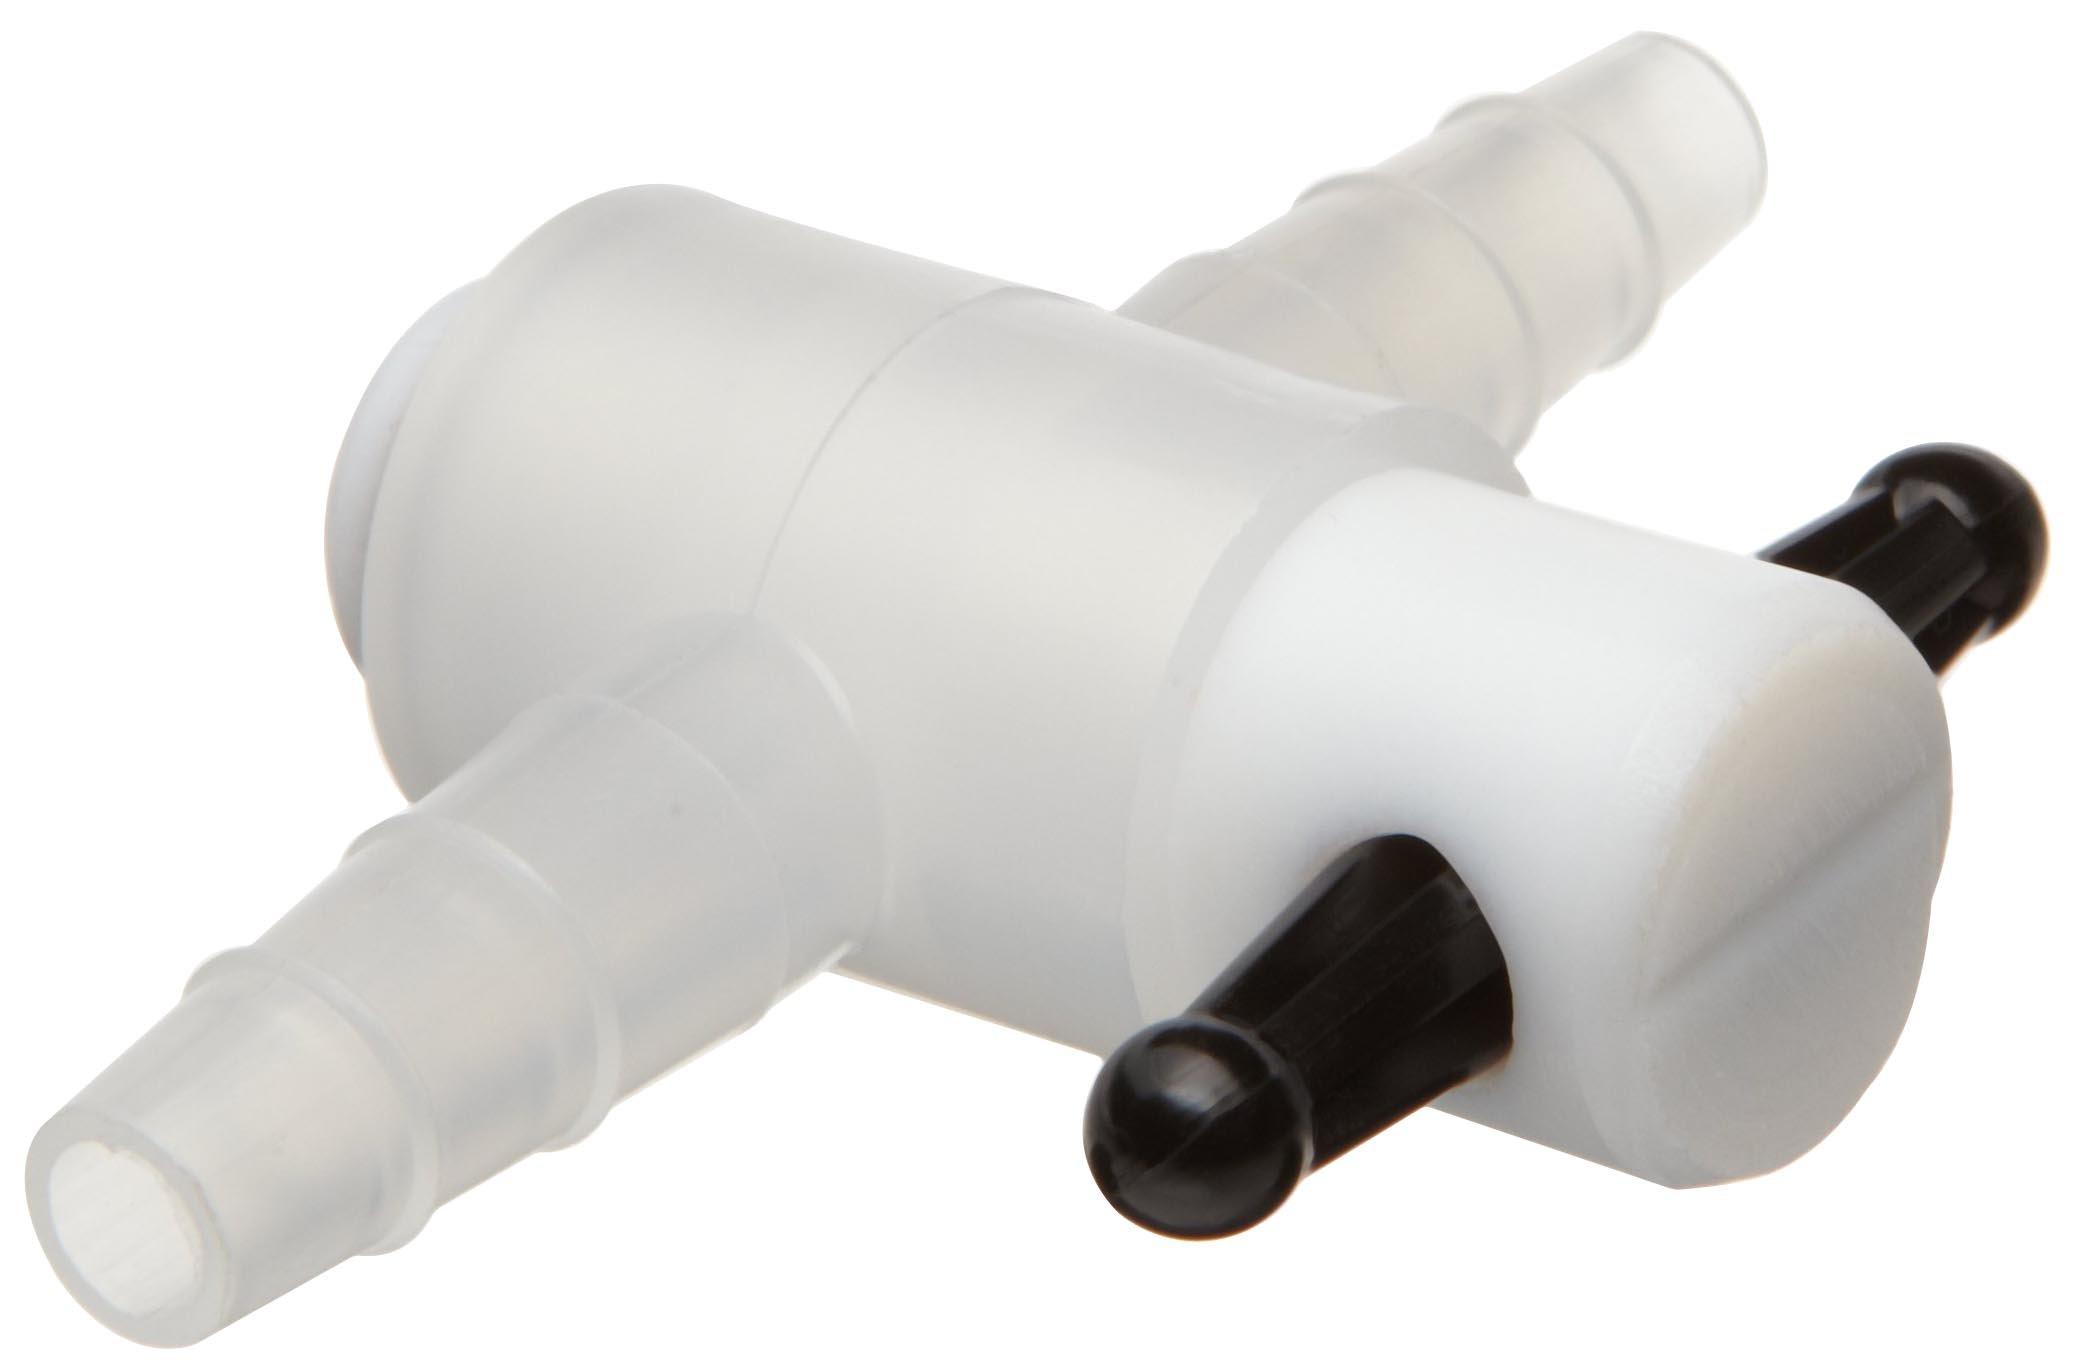 Nalgene 6470-0004 Polypropylene 3-Way Stopcock With PTFE TFE Plug, 1/4 - 5/16 Inch I.D. Autoclavable, 4mm bore